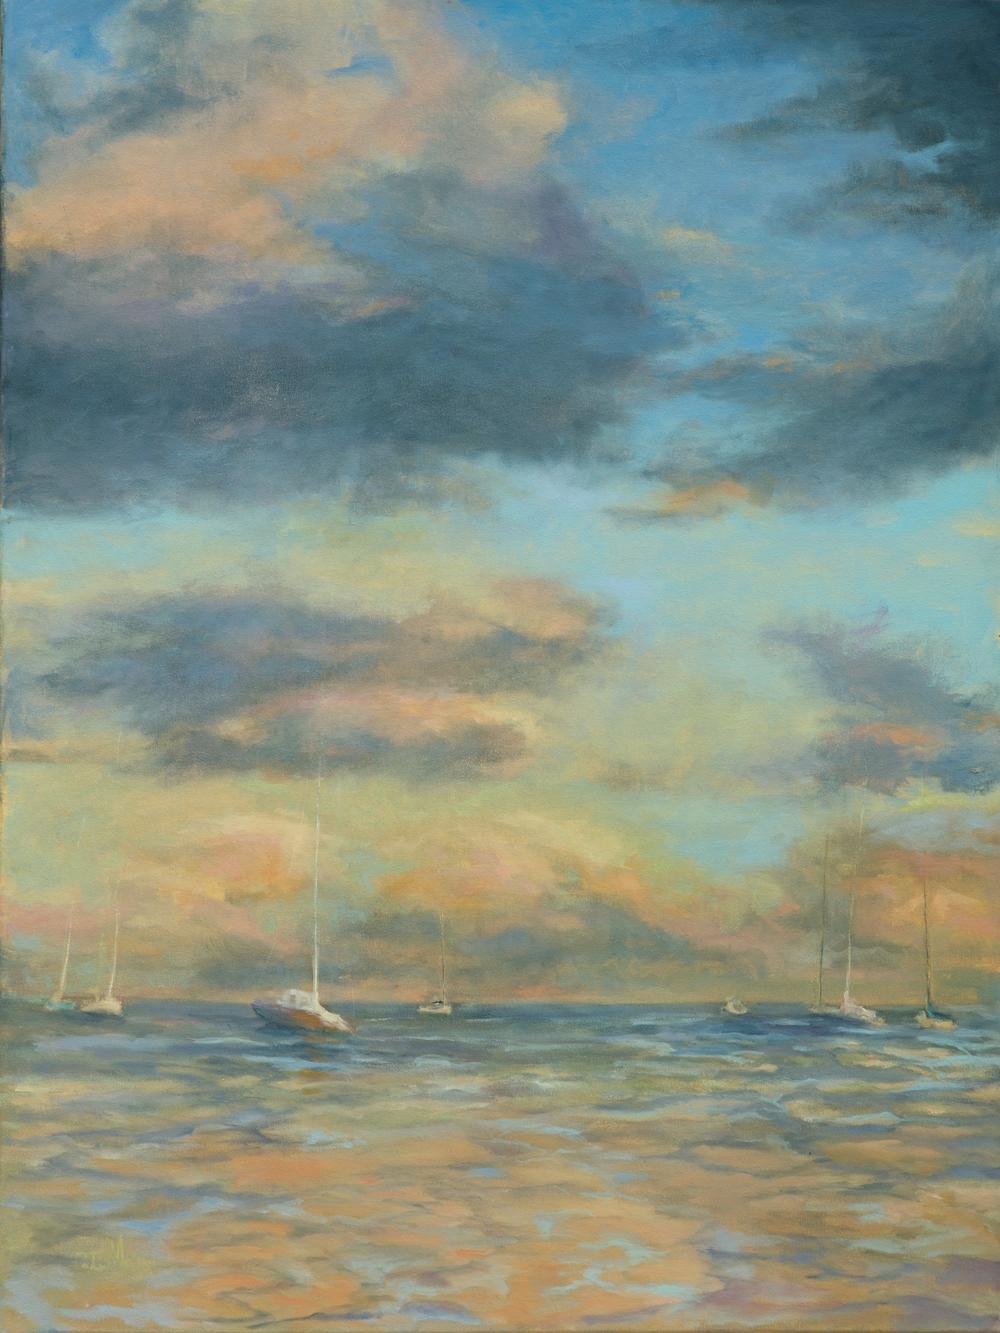 Safe harbor, oil on canvas, 30X40